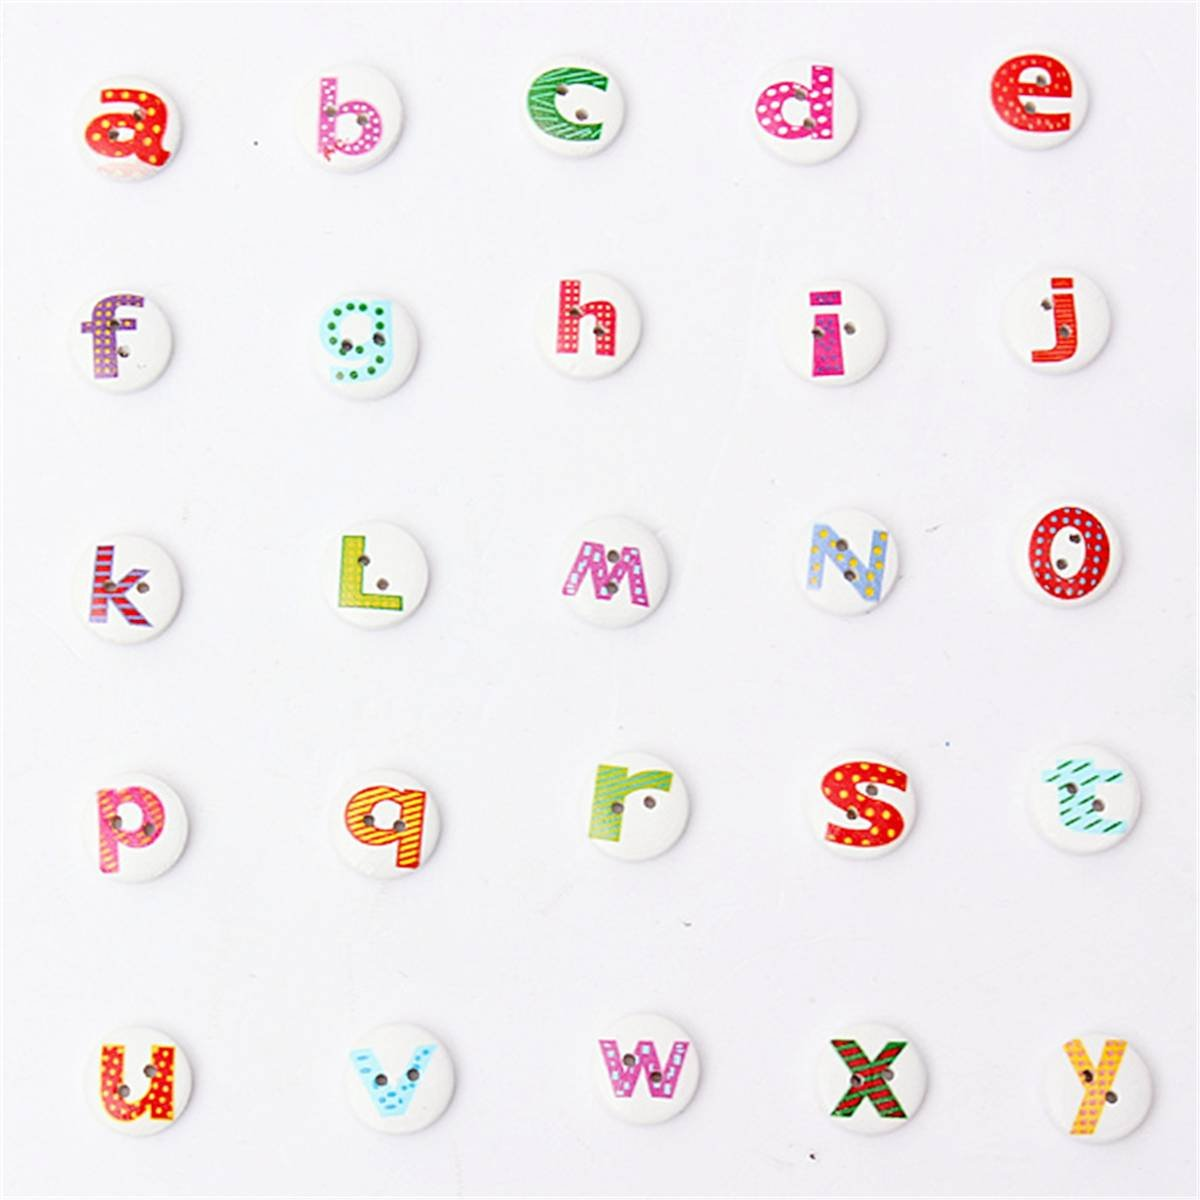 FLST 100Pcs Mixed Painted Letter Alphabet Wooden Sewing Button Scrapbooking